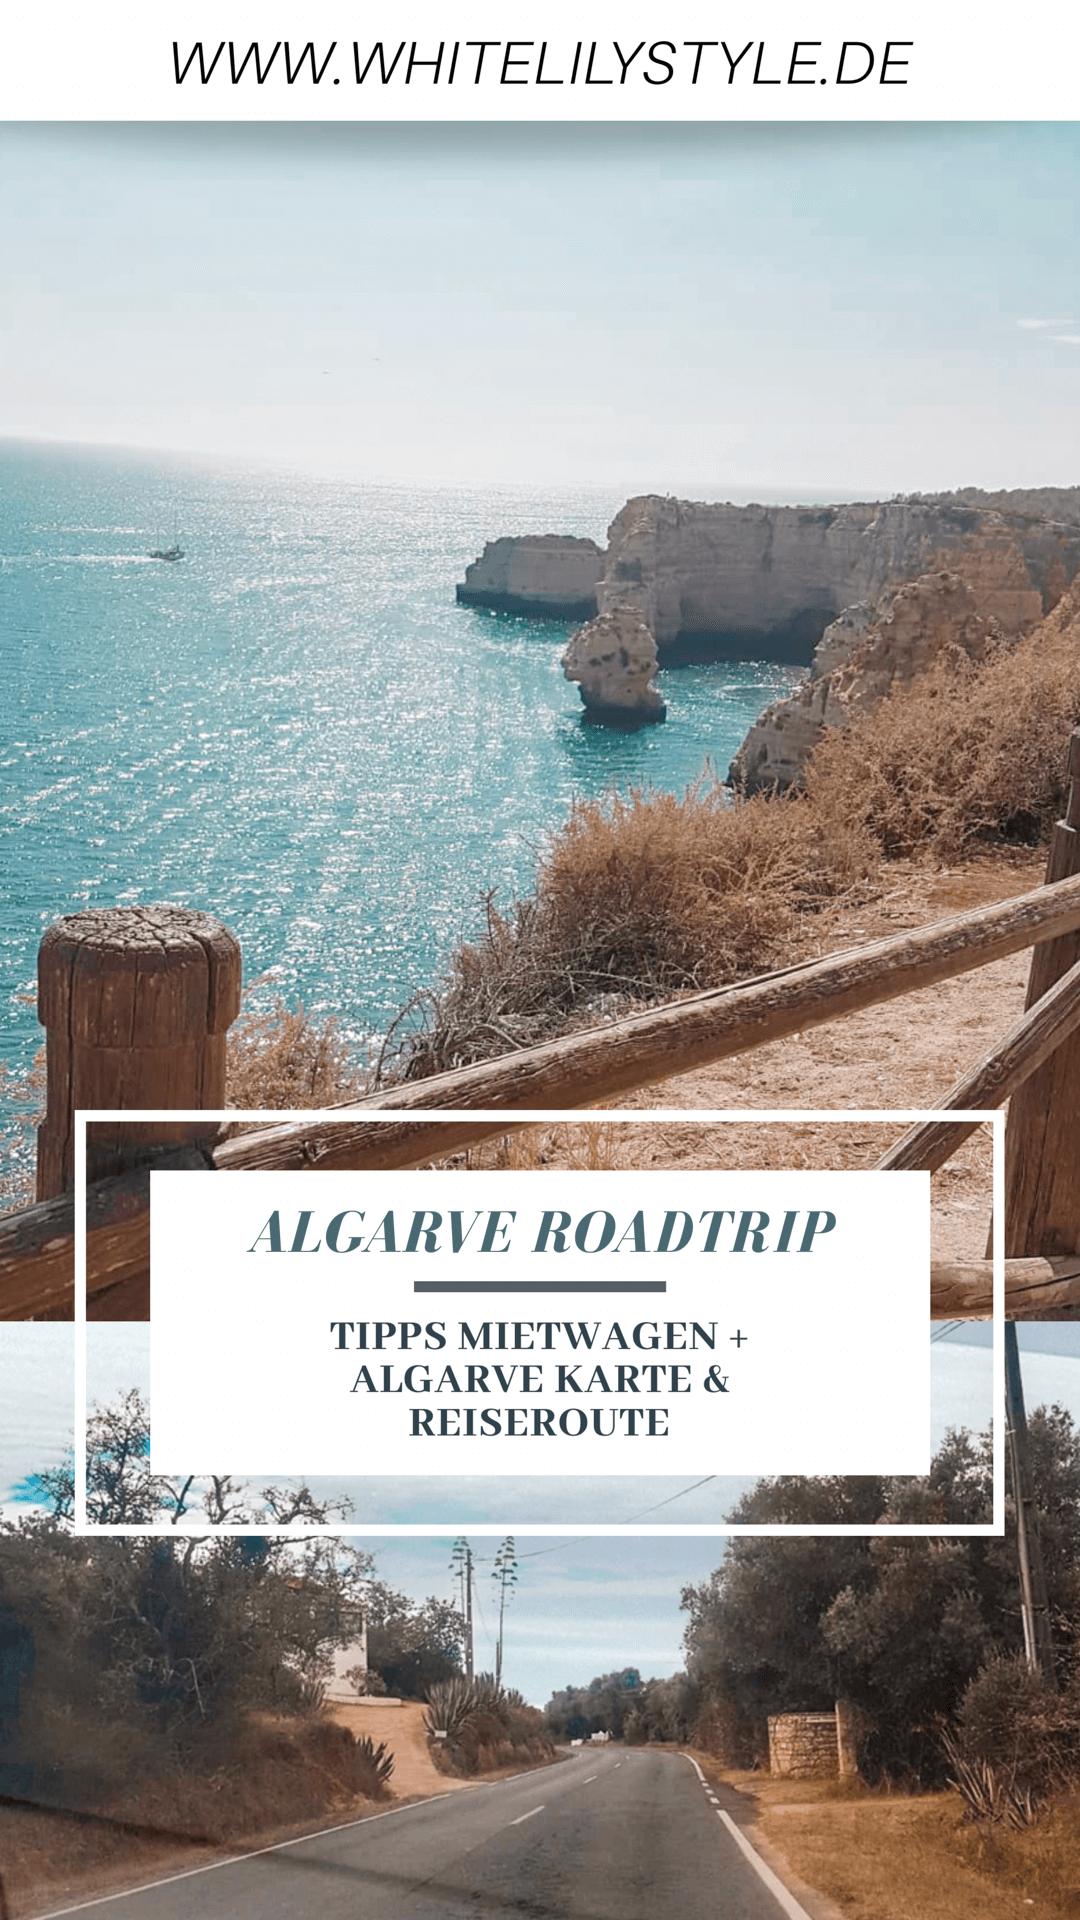 Algarve Roadtrip - Reiseroute, Algarve Karte, Mietwagen Tipps